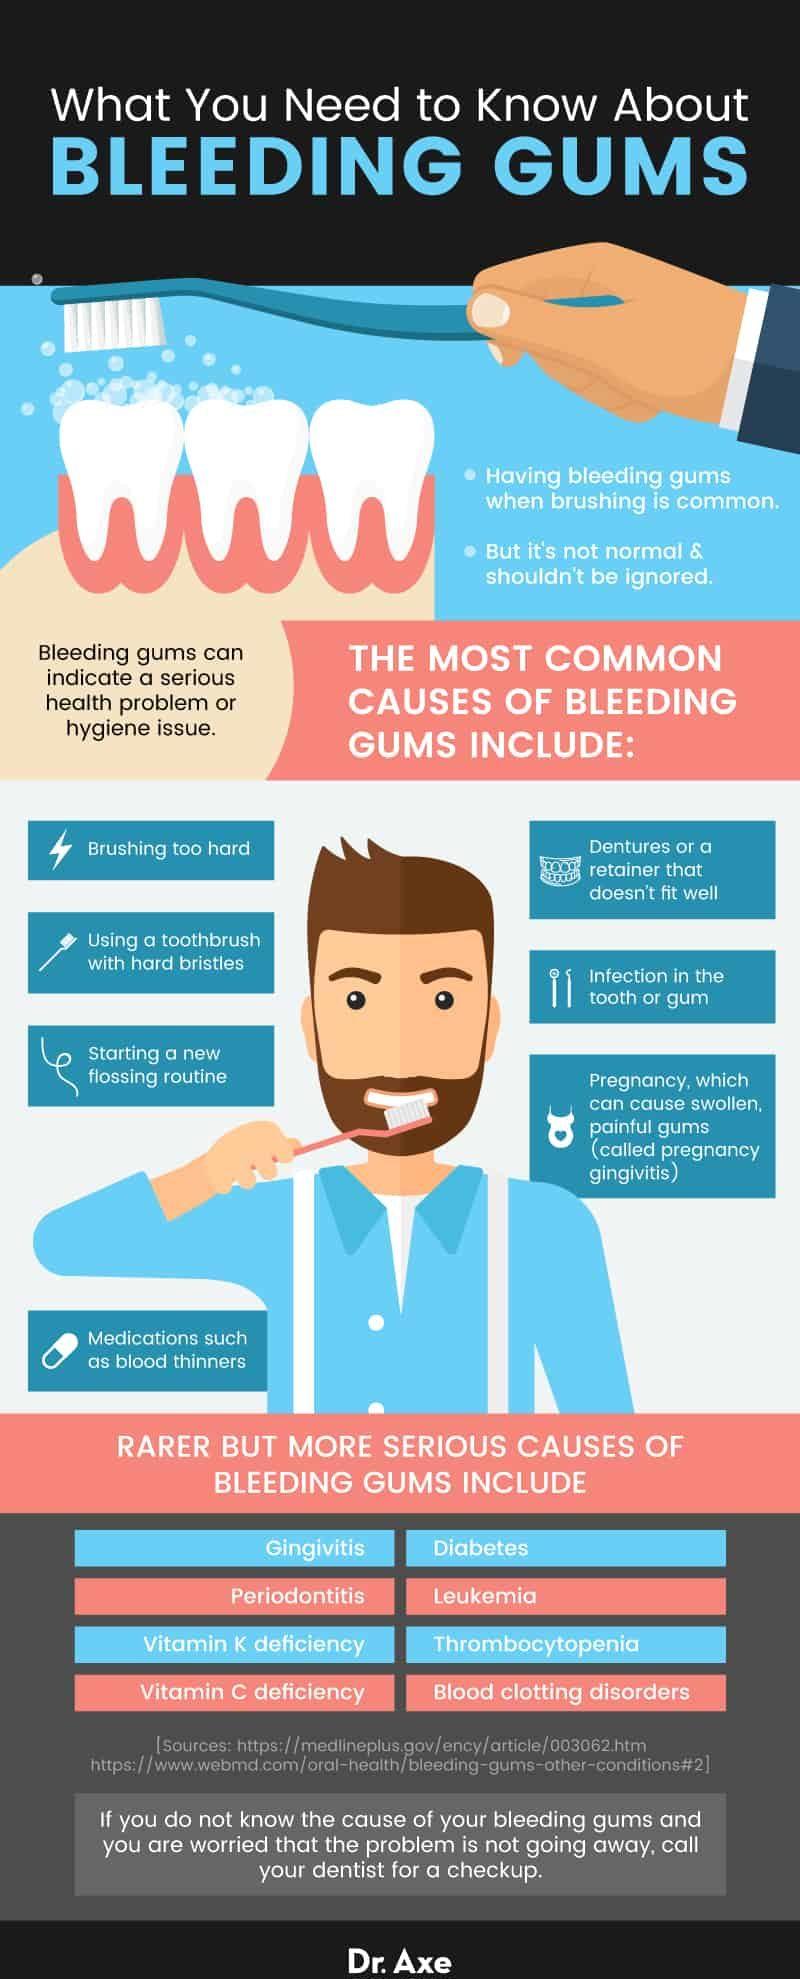 All about bleeding gums - Dr. Axe